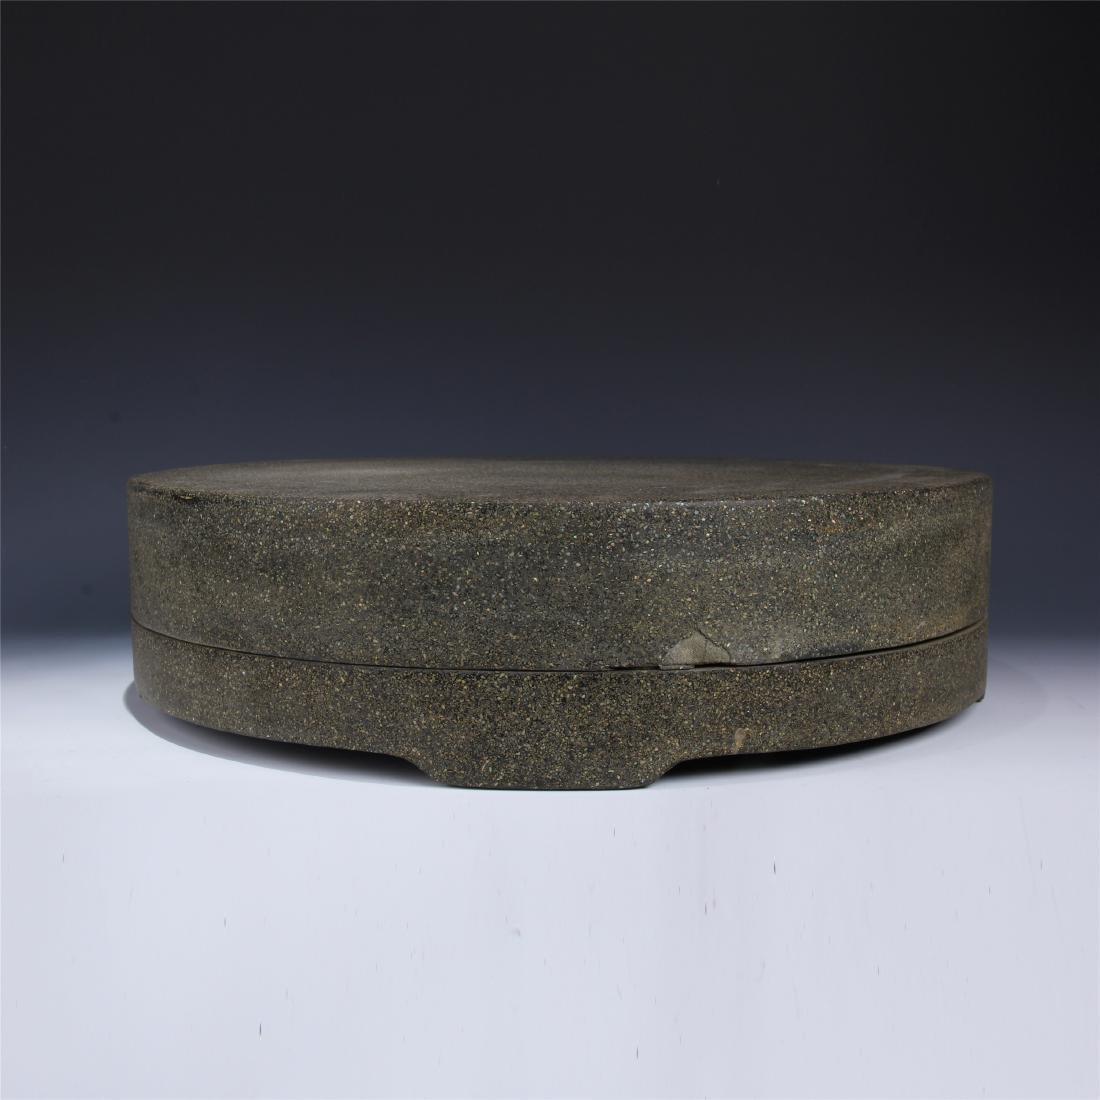 CHINESE BLACK LACQUERED ROUND BOX